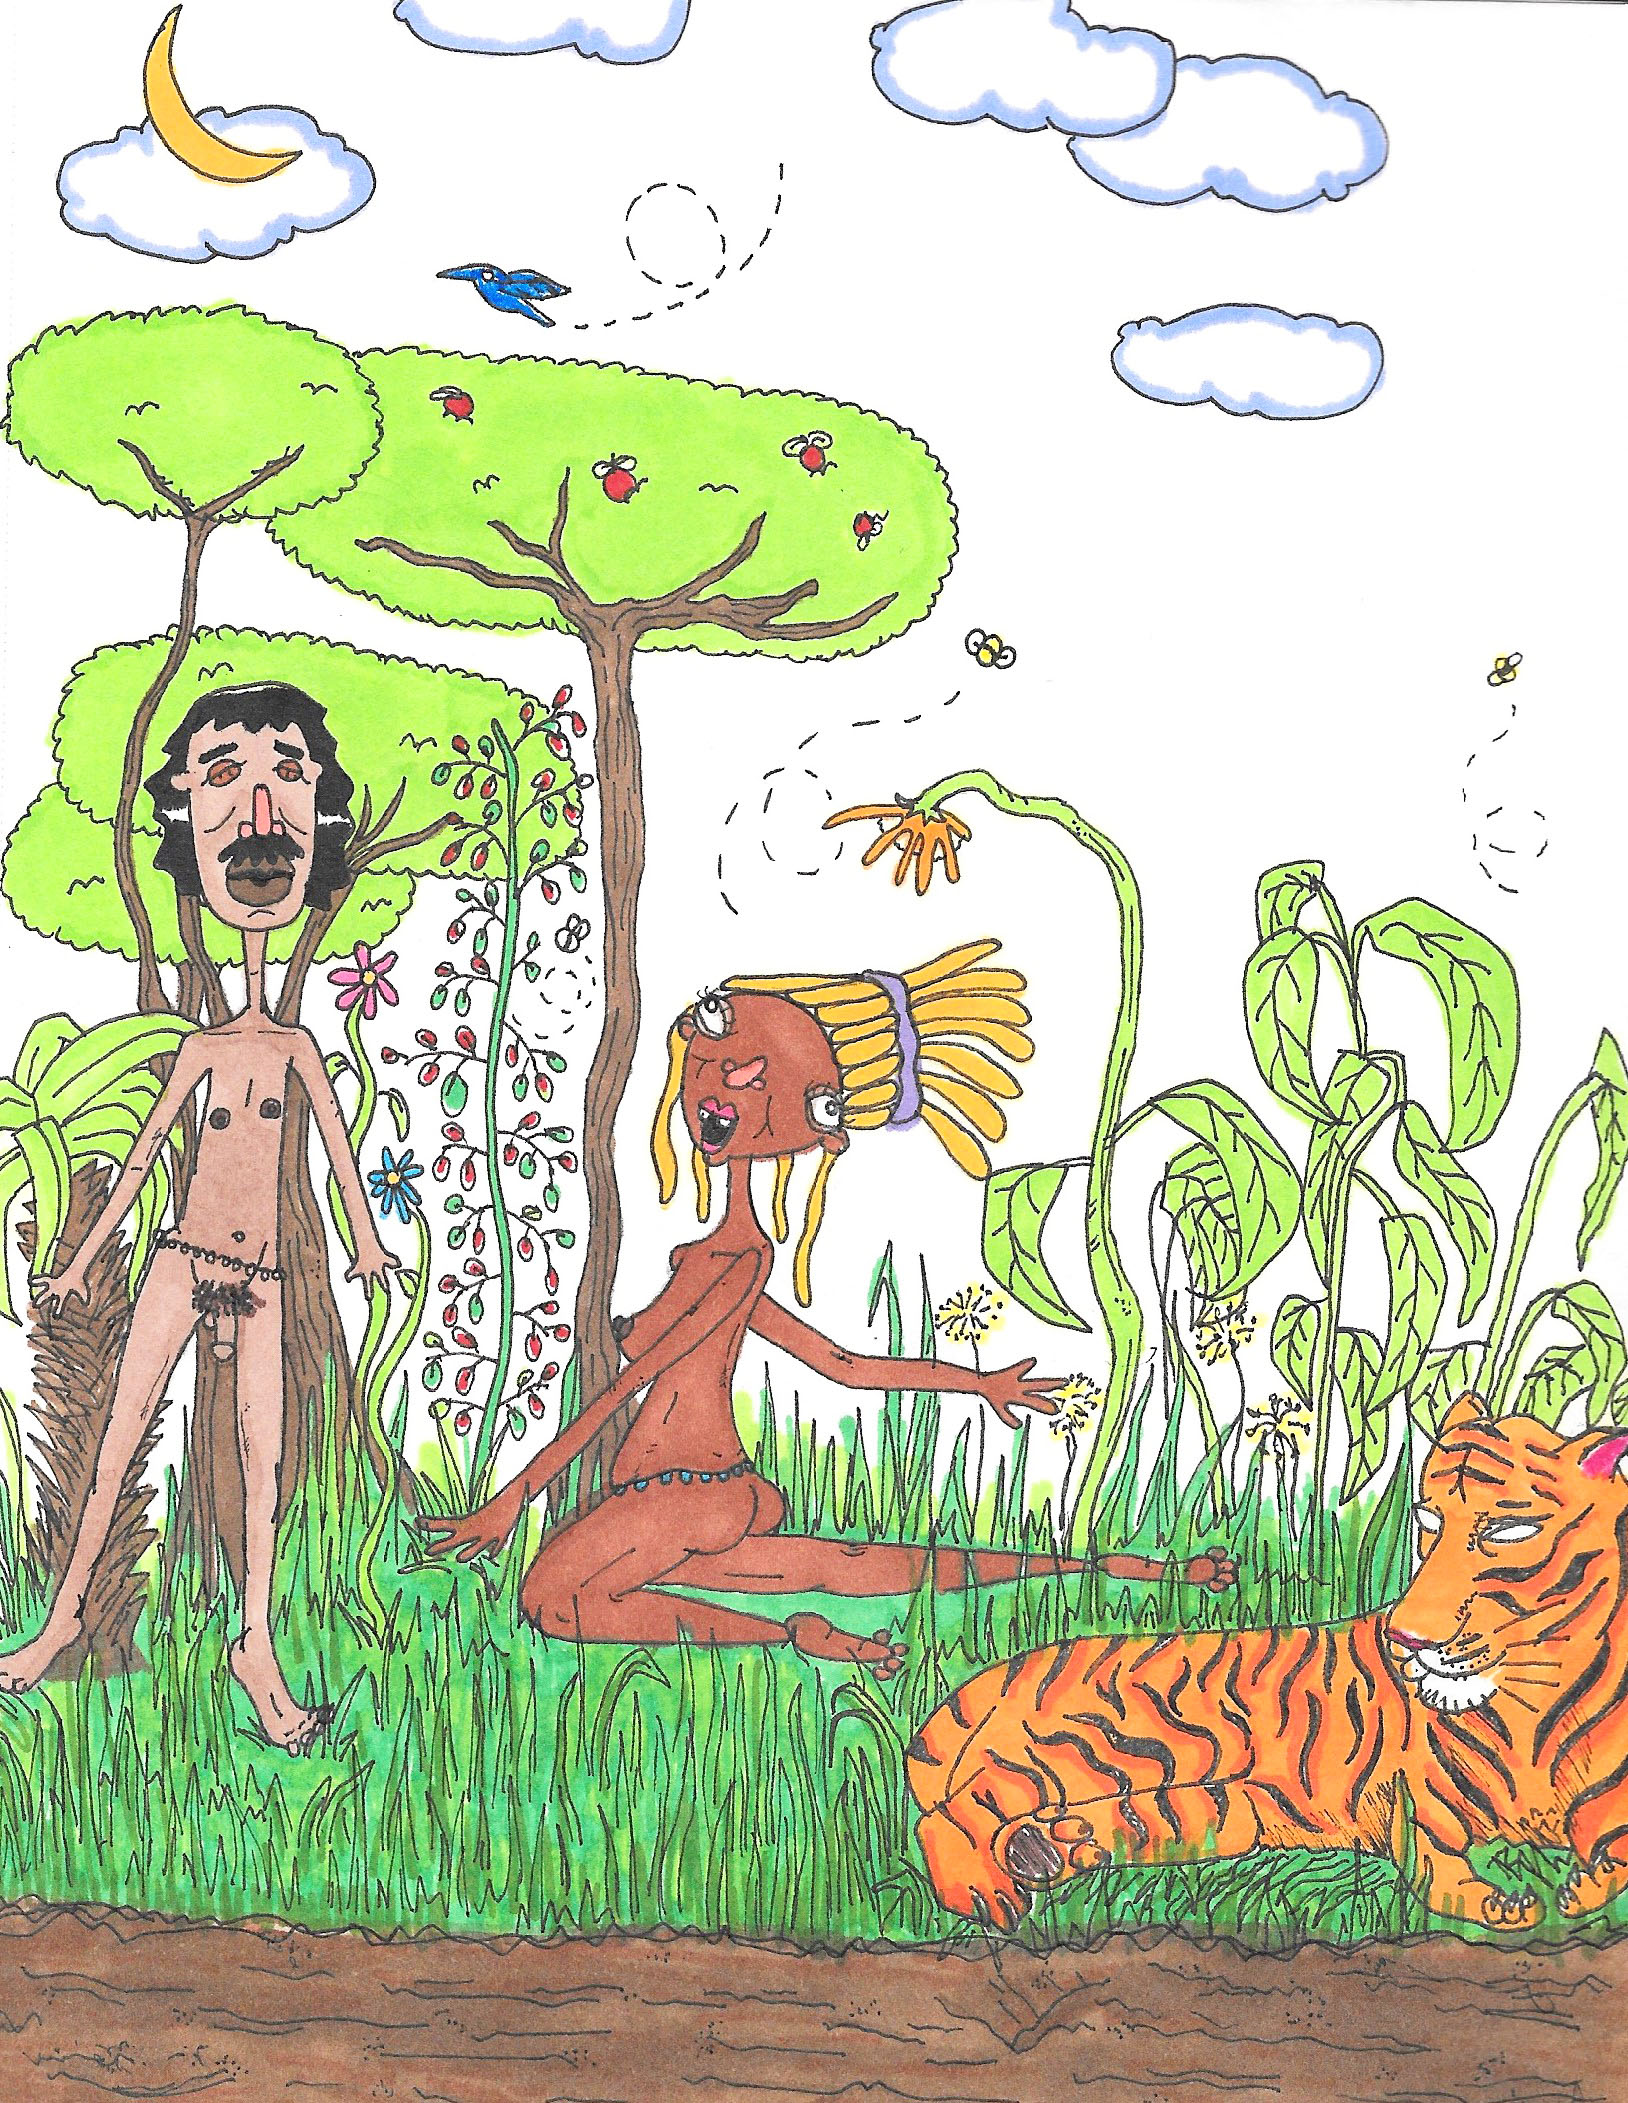 "feelin' myself in the garden of eden pt. 2 , 2017     Ink & marker on paper  5.5"" x 8.5"""